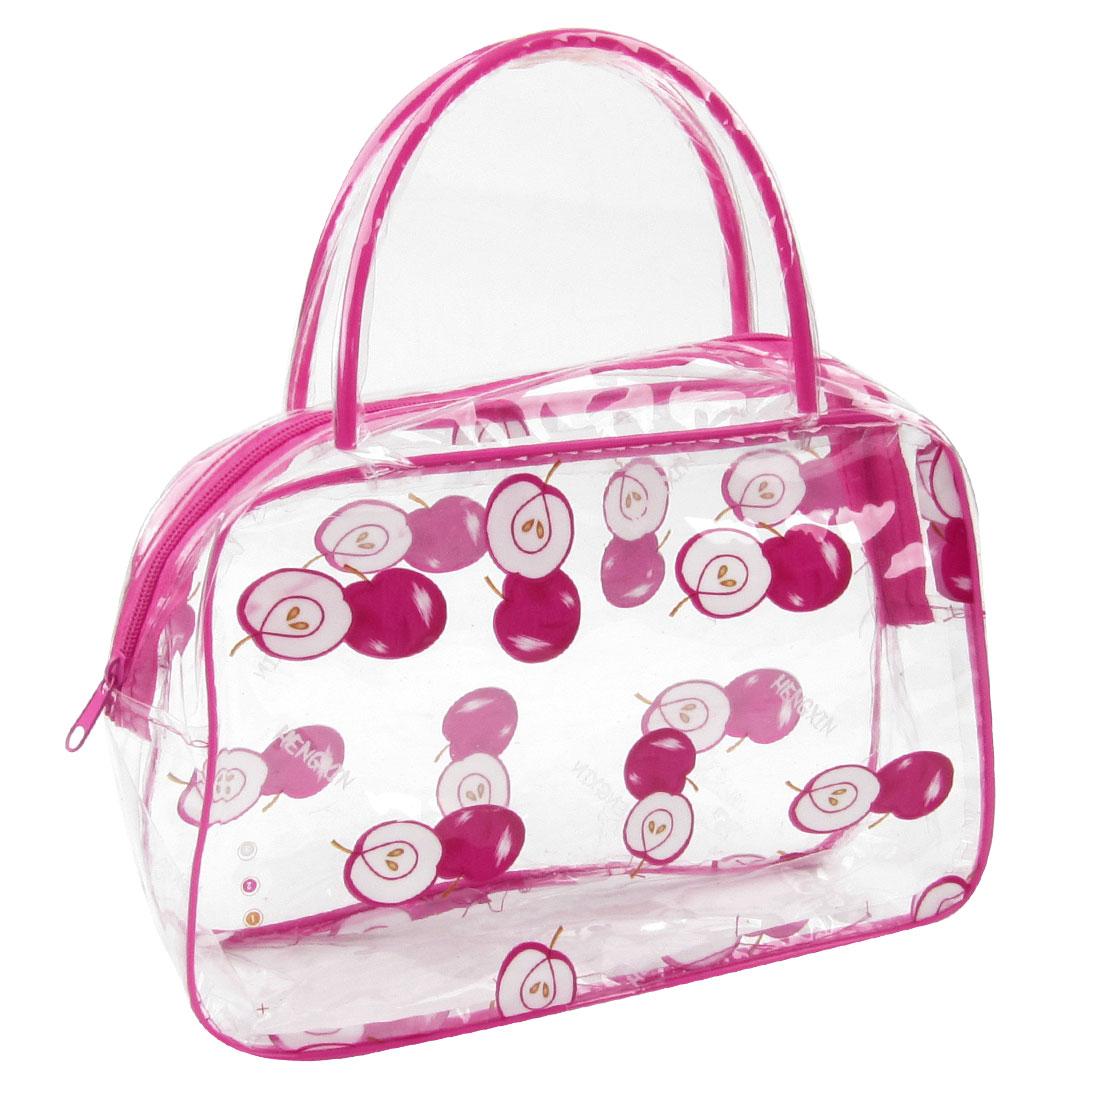 Women Apples Print Zipper Closure Cosmetic Bag Organizer Pink Clear